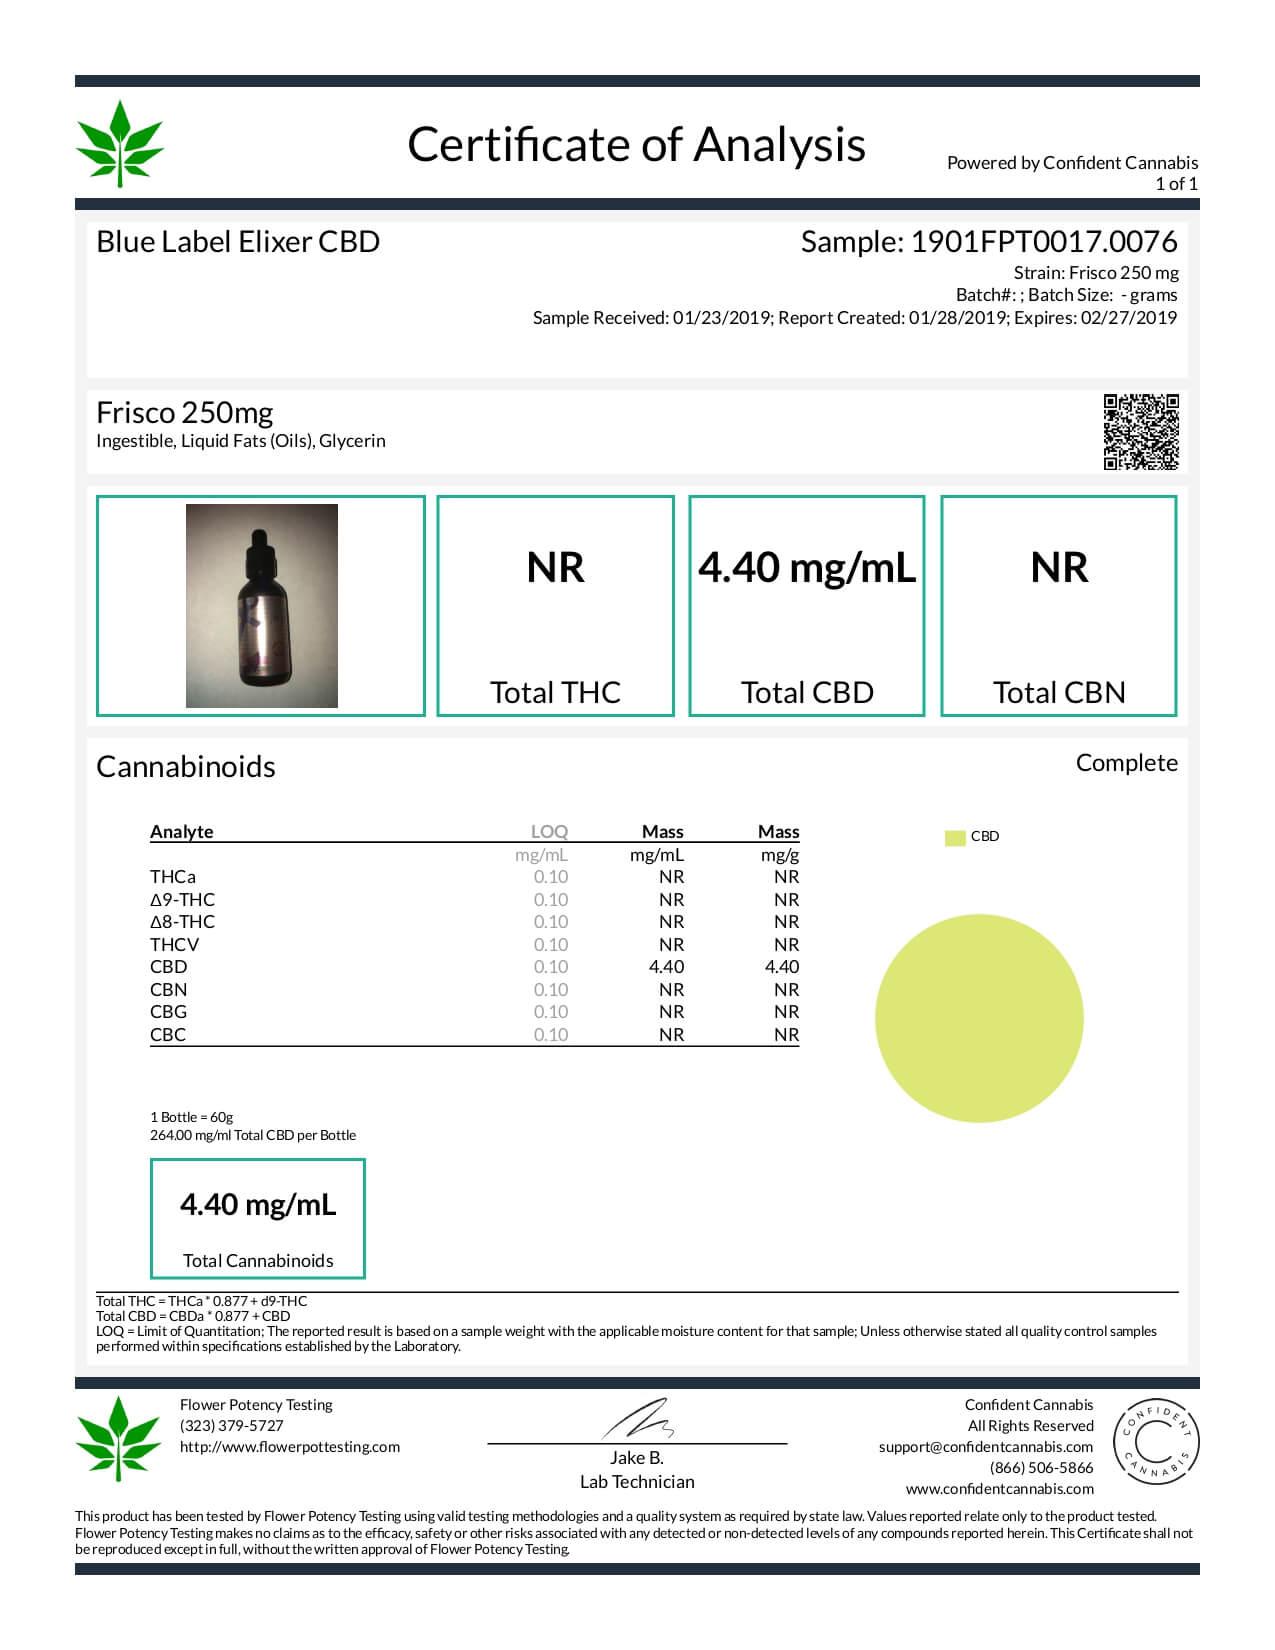 Blue Label CBD Vape Juice Frisco 250mg Lab Report